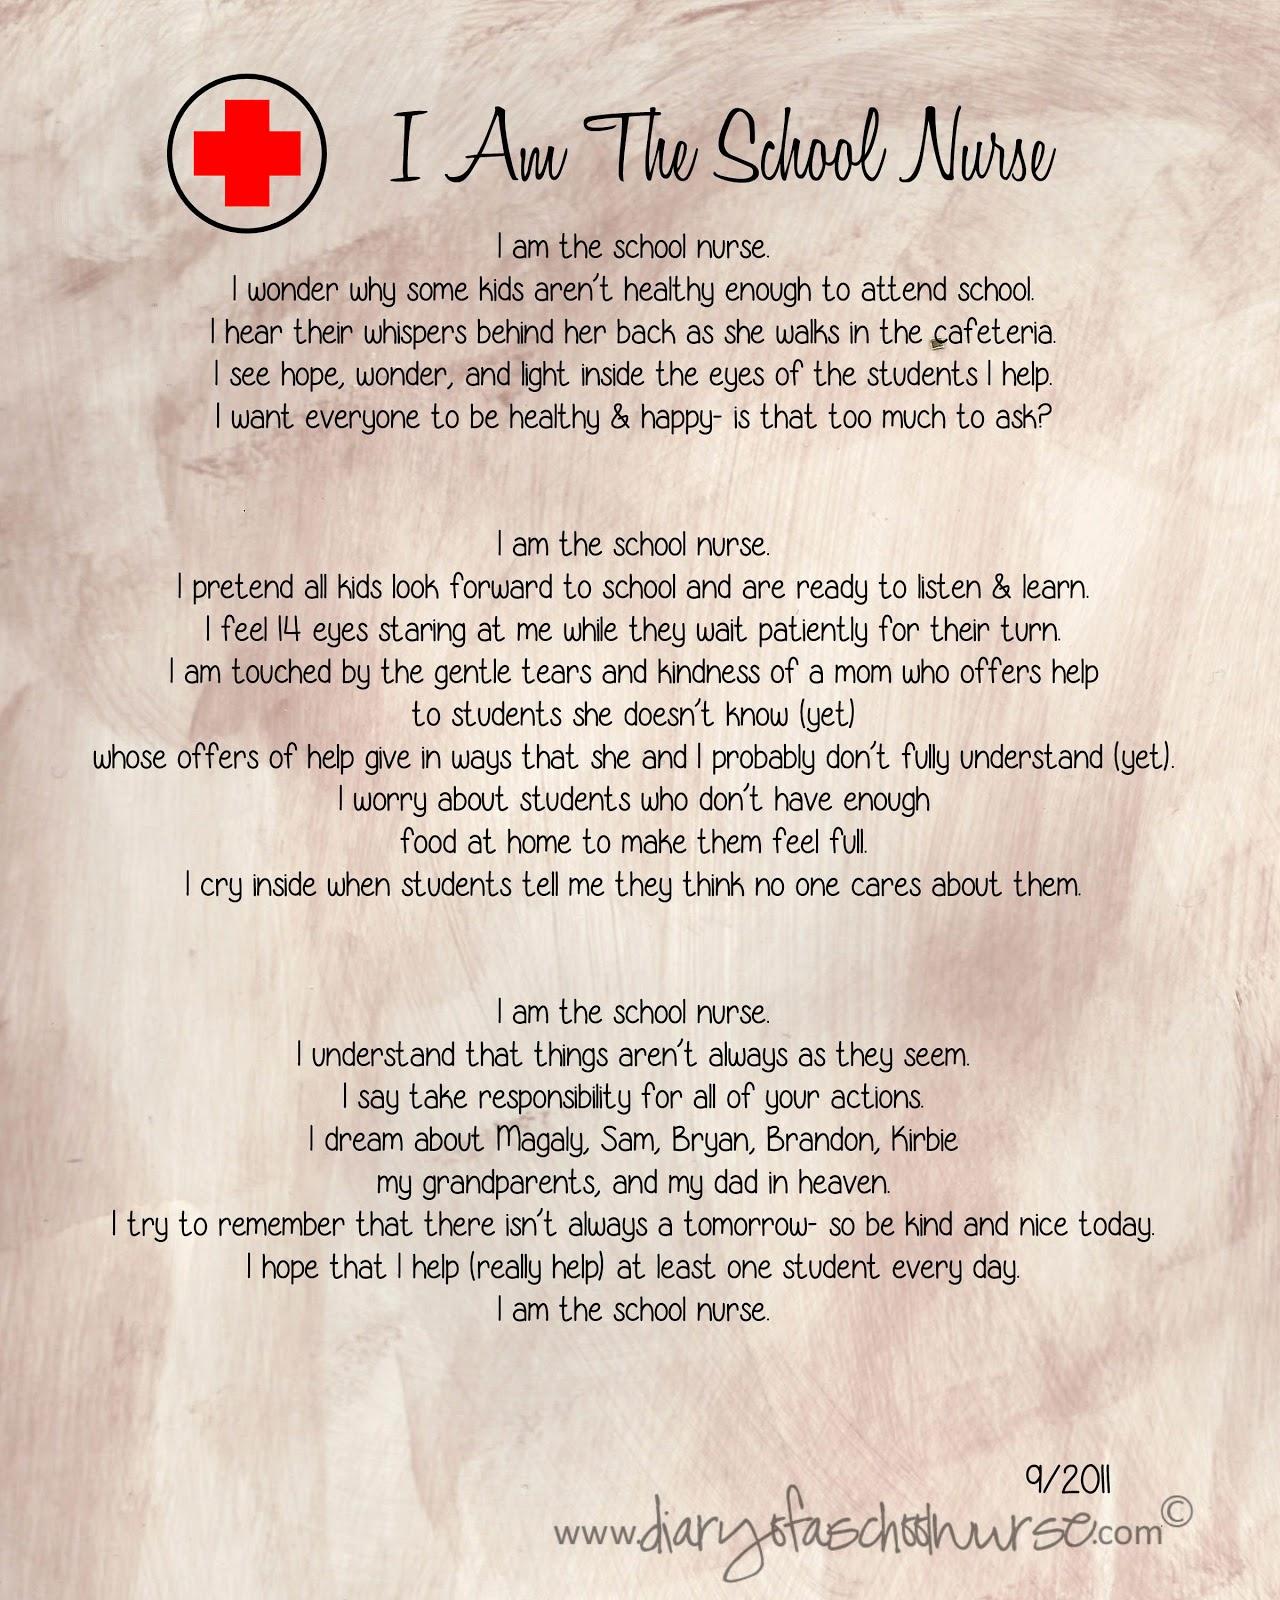 diary of a school nurse 2013 2011 i am the school nurse poem